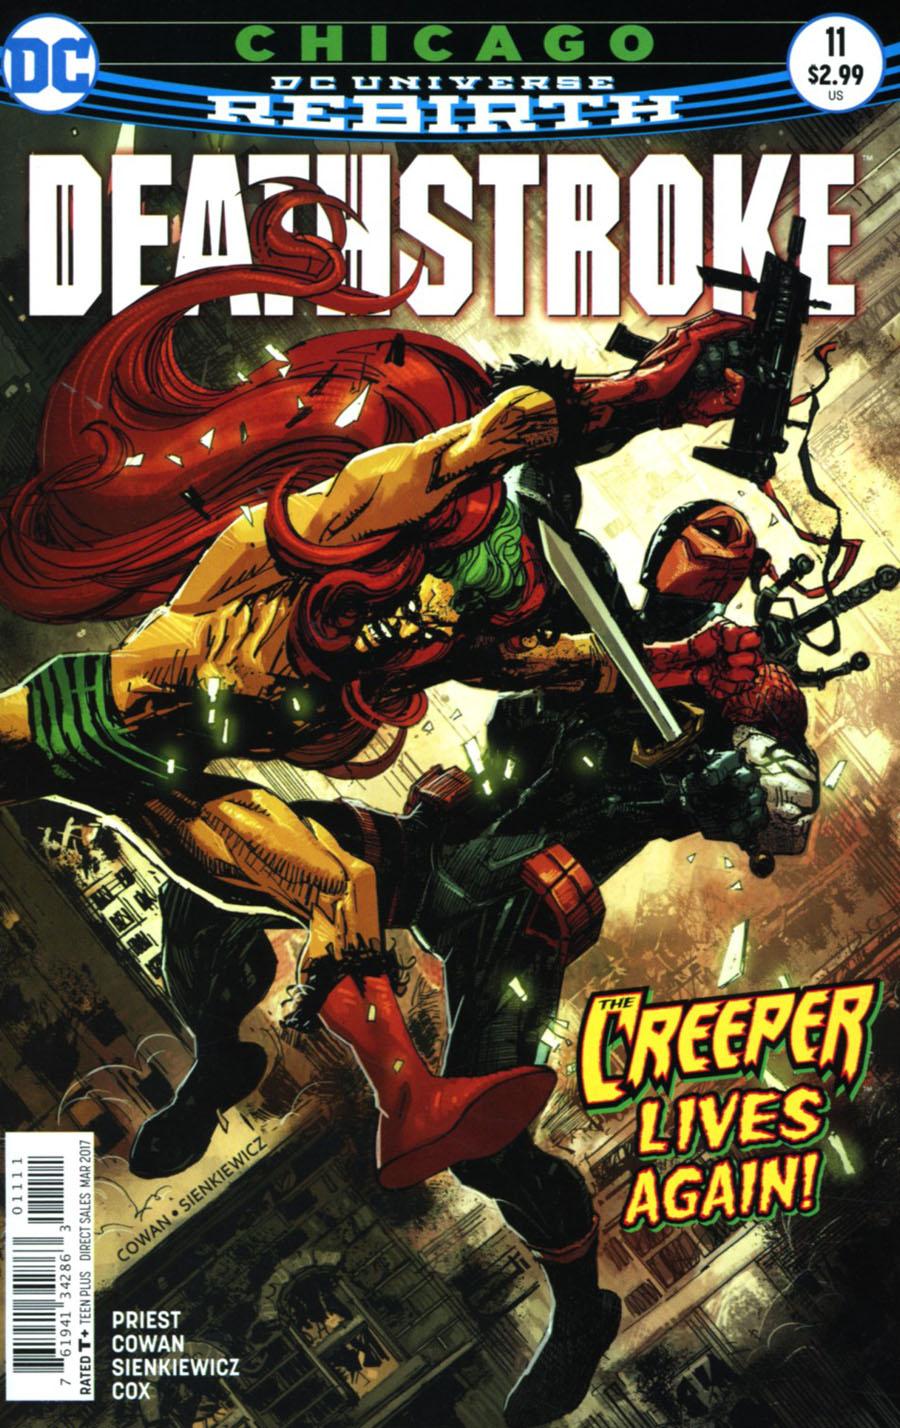 Deathstroke Vol 4 #11 Cover A Regular Denys Cowan & Bill Sienkiewicz Cover